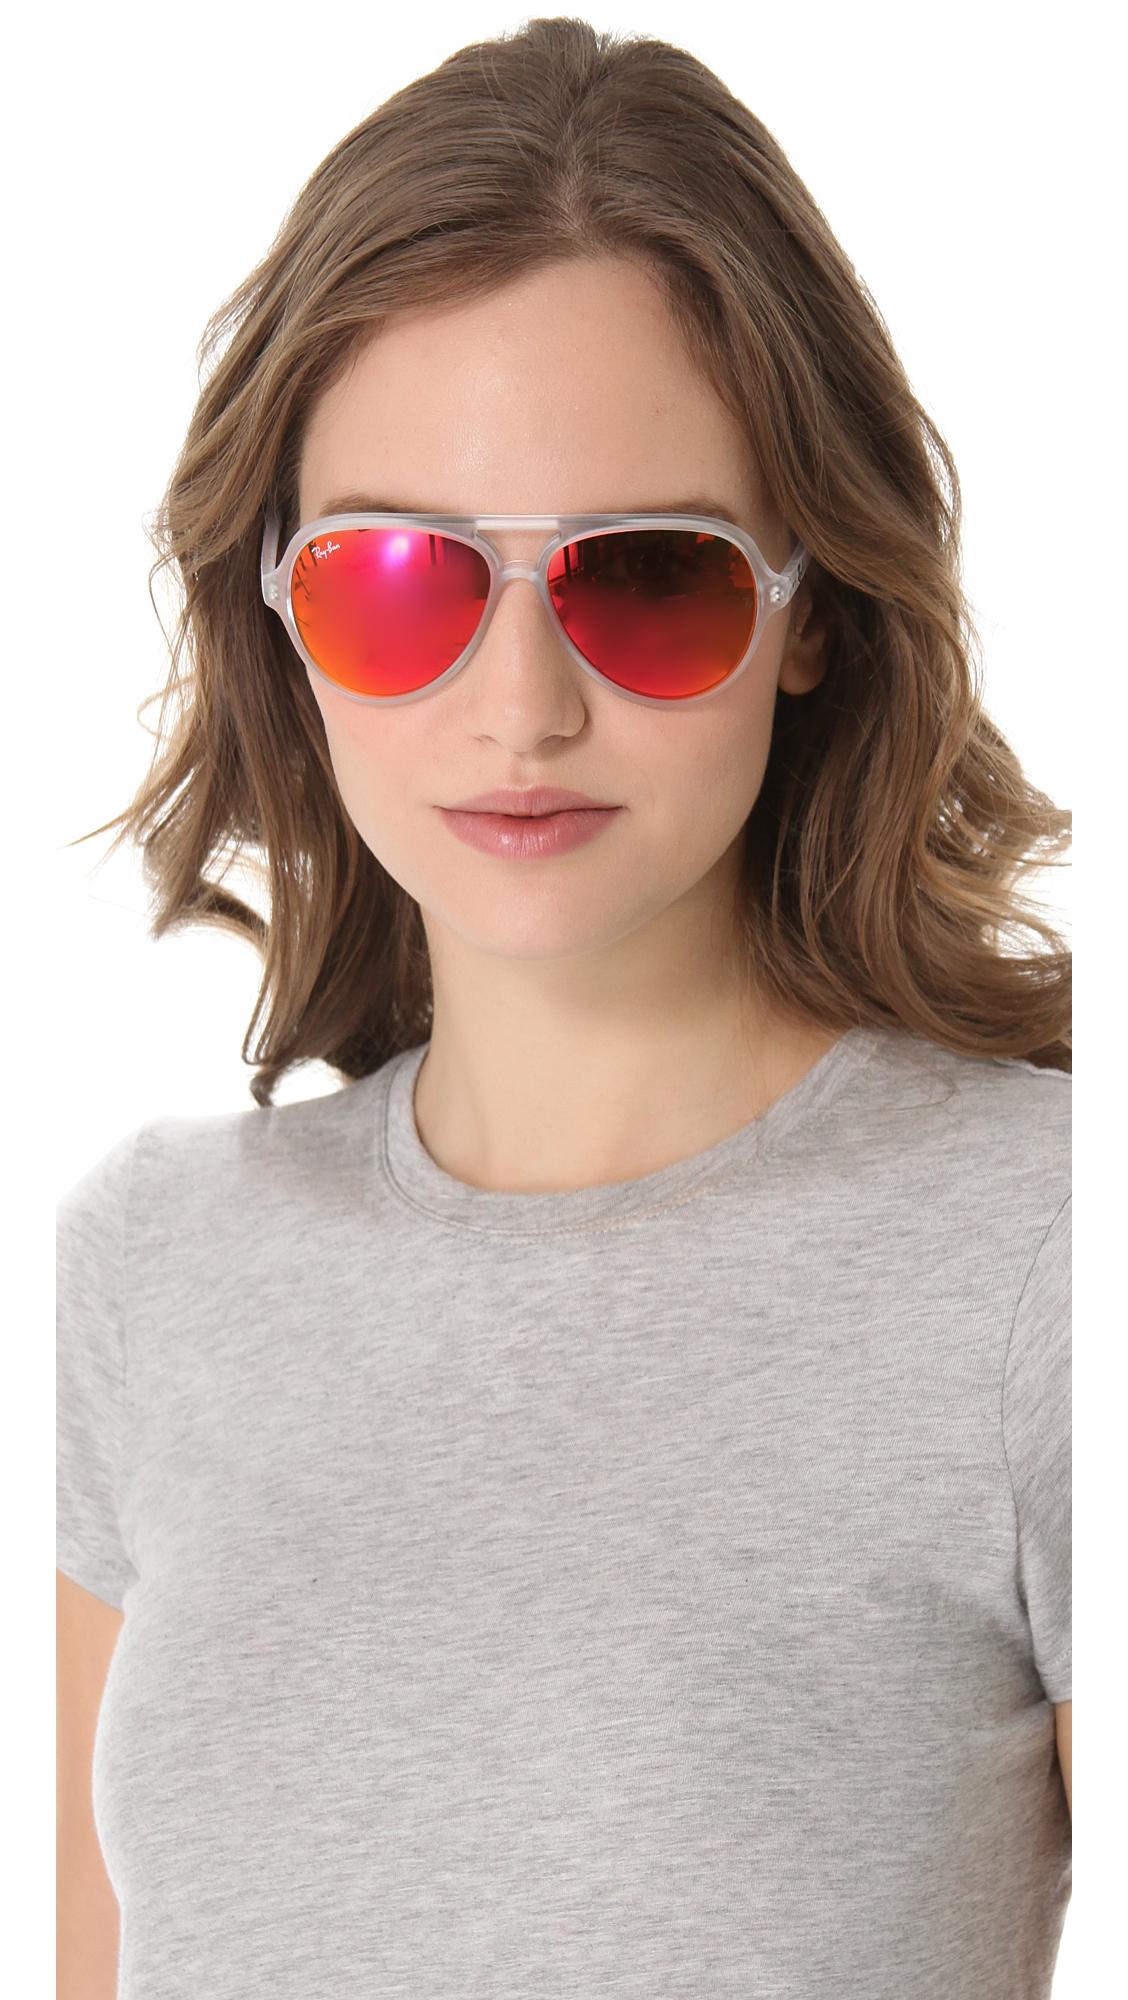 cc646e7261f Lyst - Ray-Ban Mirrored Cats Aviator Sunglasses